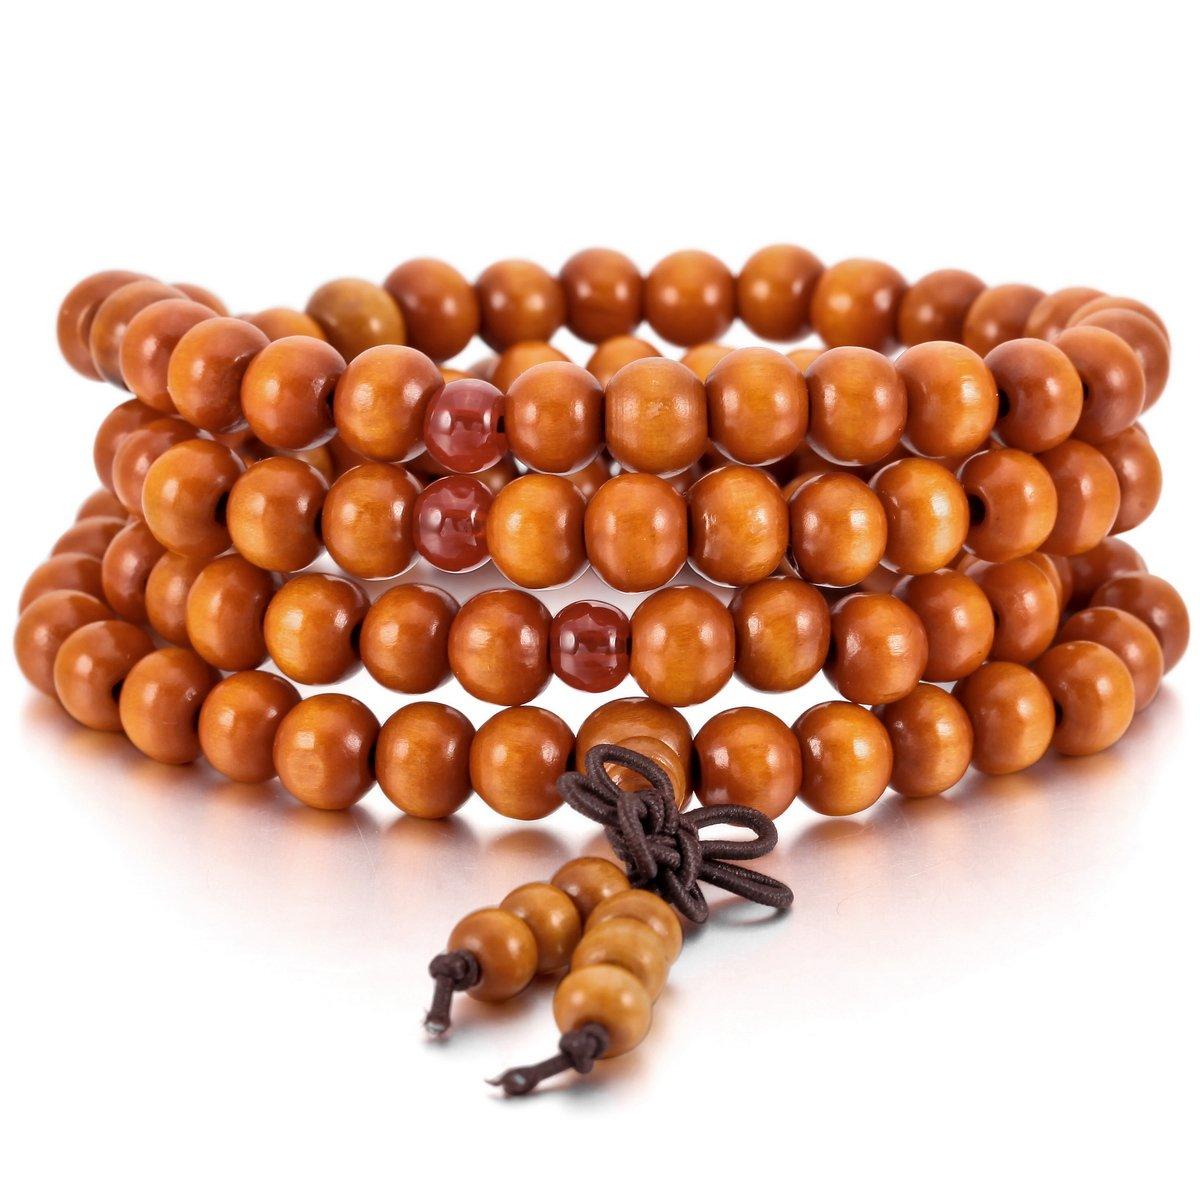 MOWOM Wood Bracelet Link Wrist Necklace Chain Tibetan Buddhist Sandalwood Bead Prayer Buddha Mala Chinese knot ca5020056